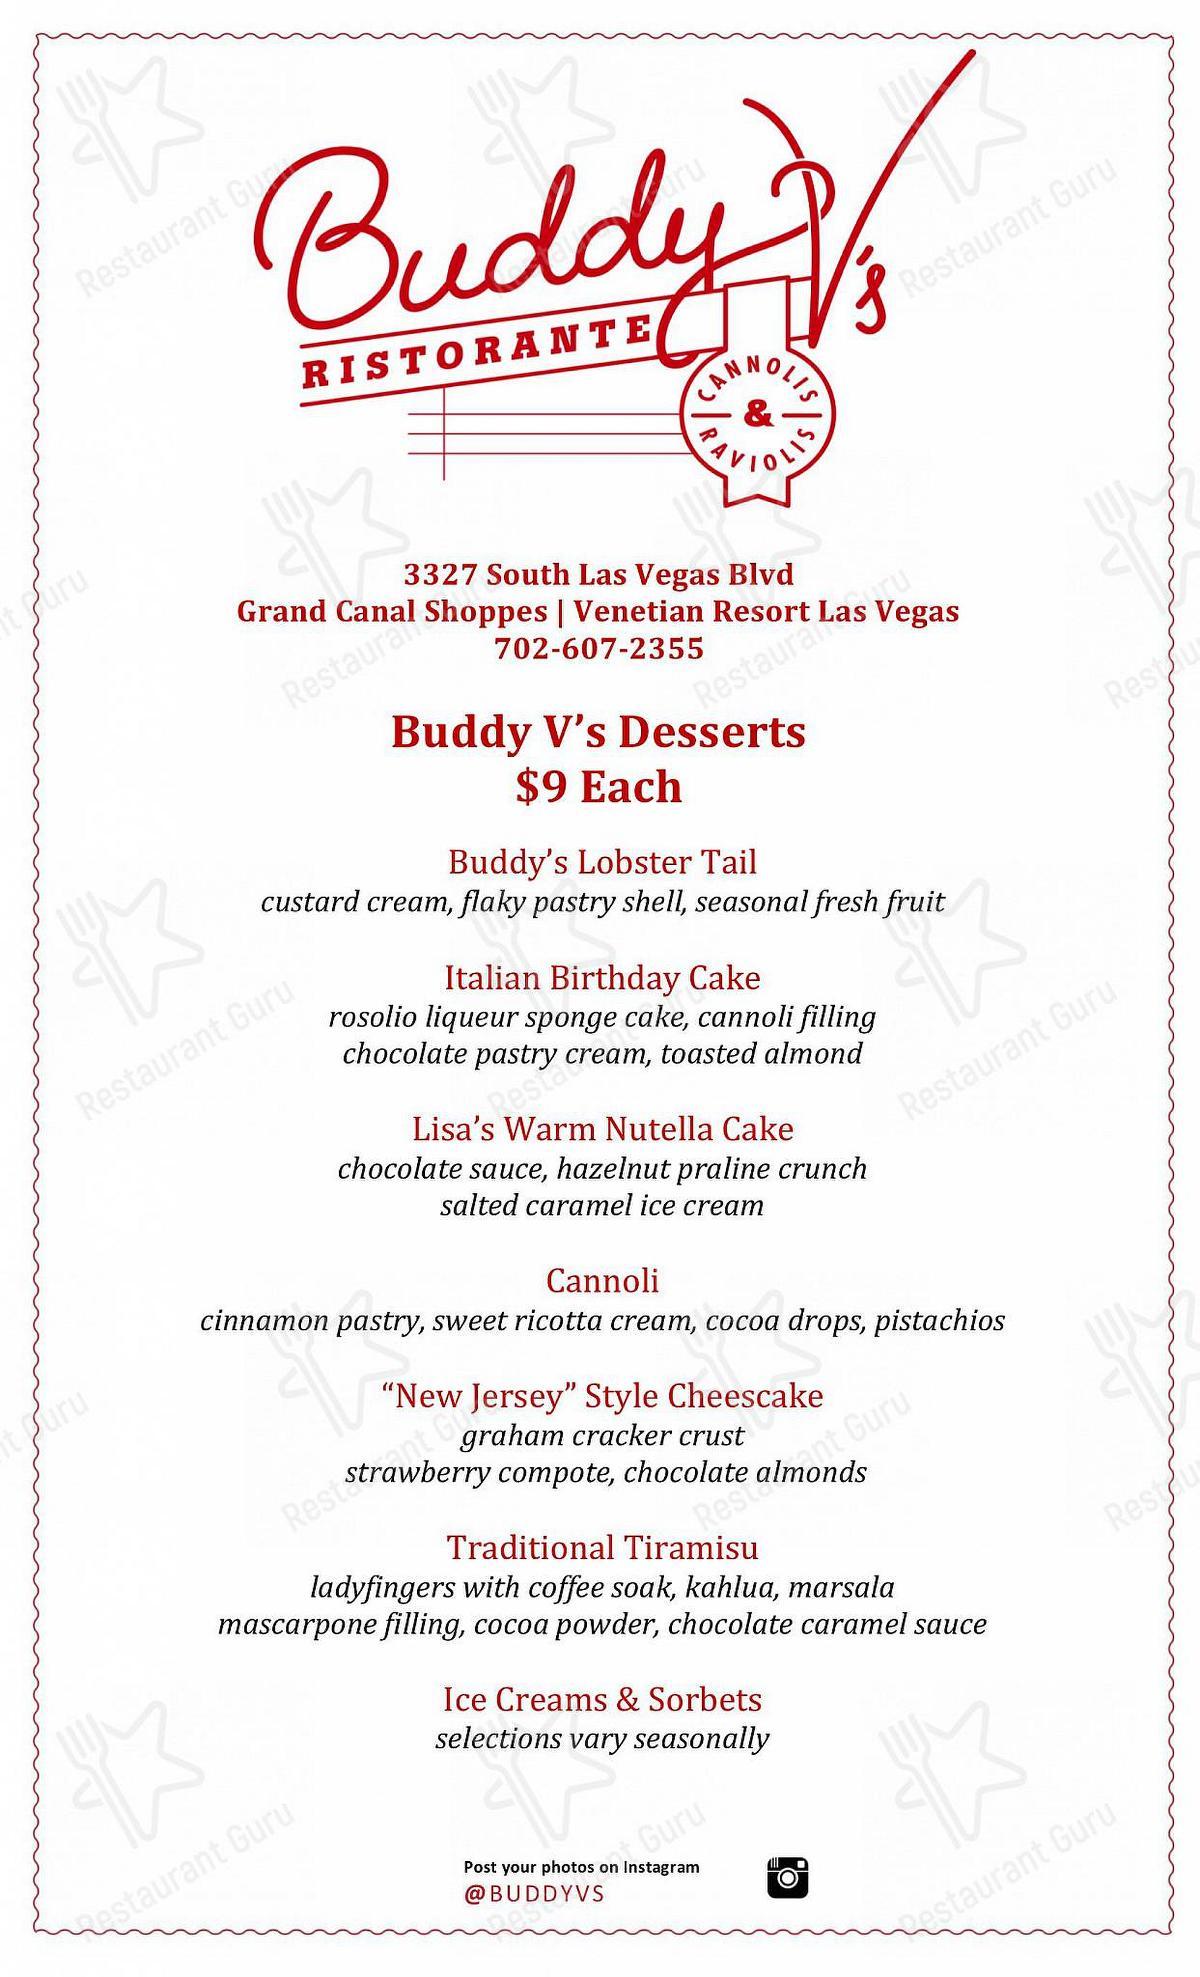 Buddy V's Ristorante en Las Vegas - Dessert Menu